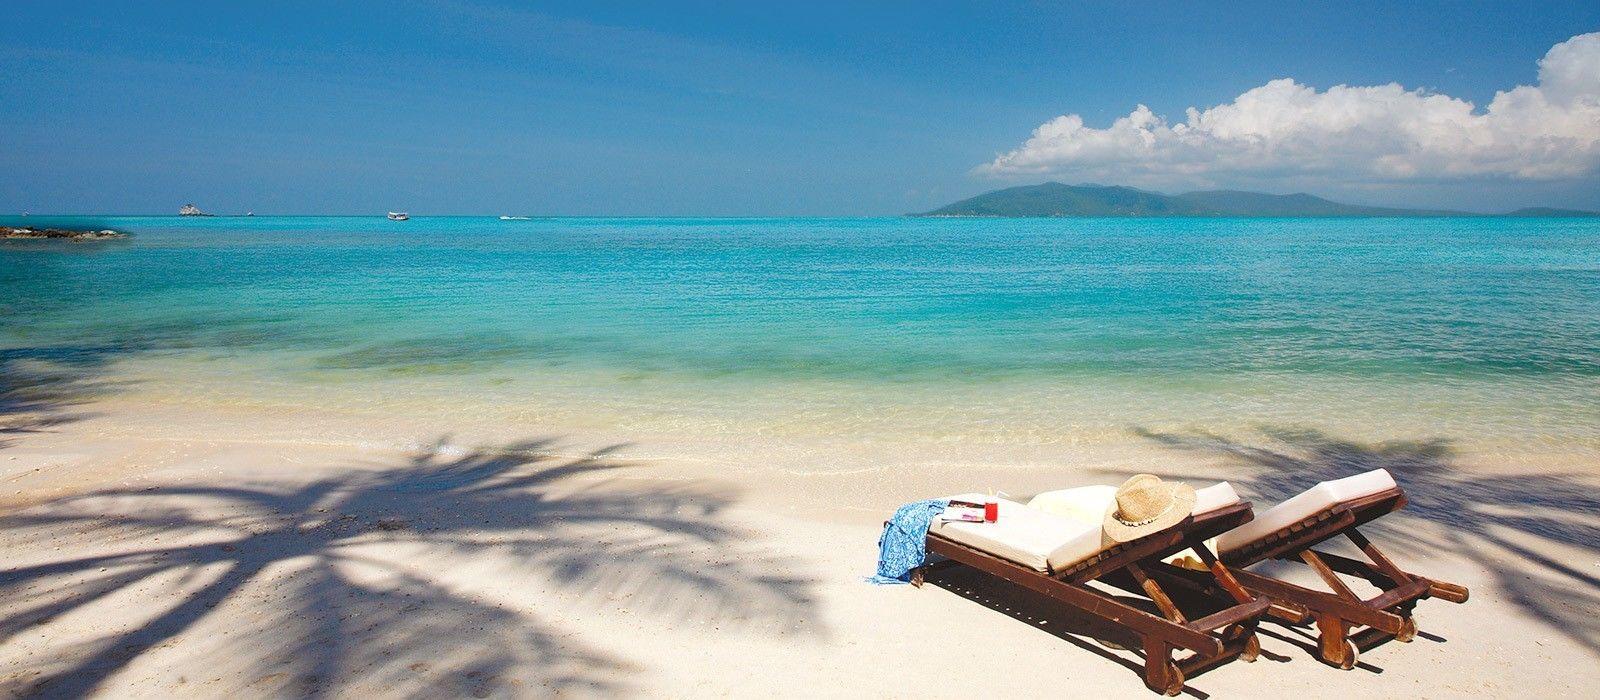 Destination Koh Samui Thailand